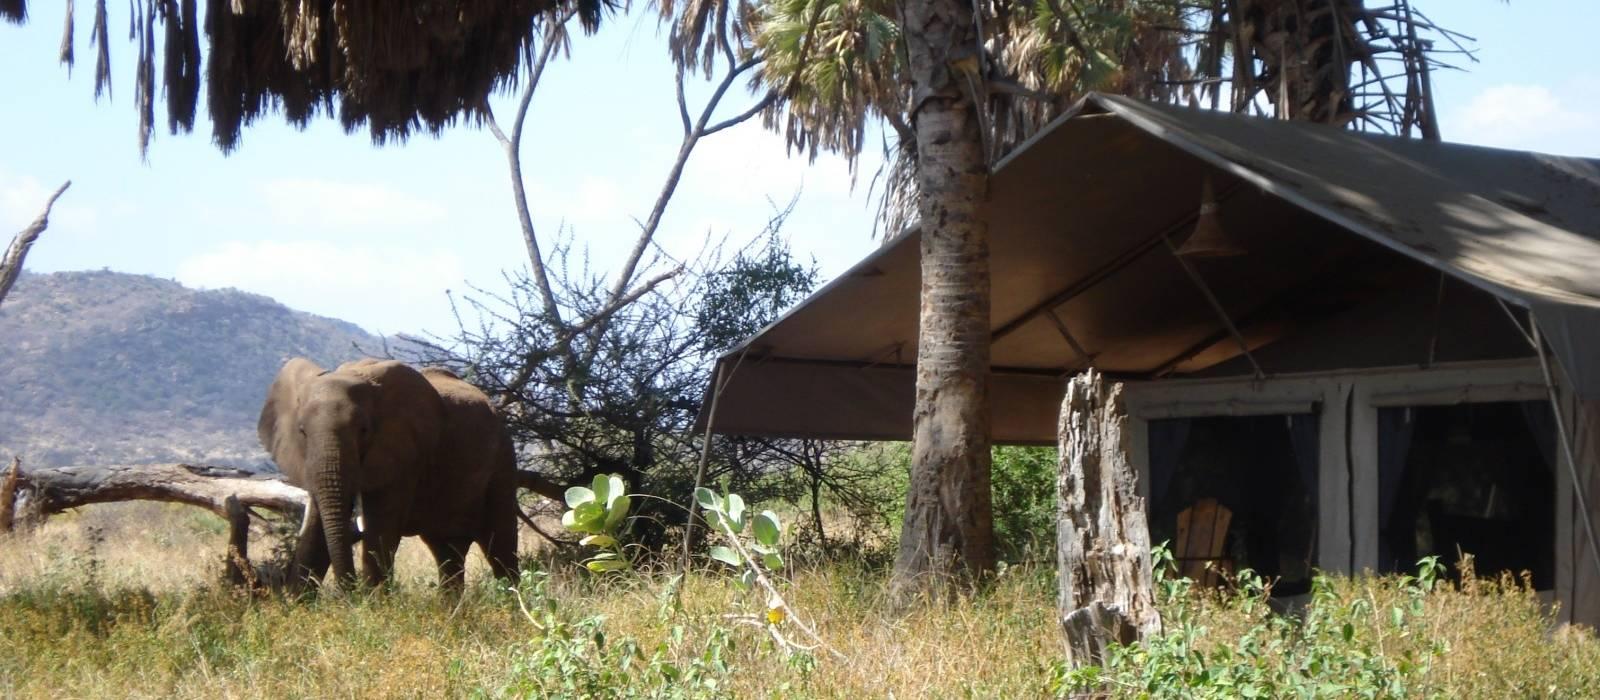 Elephant Bedroom Camp Hotel Enchanting Travels